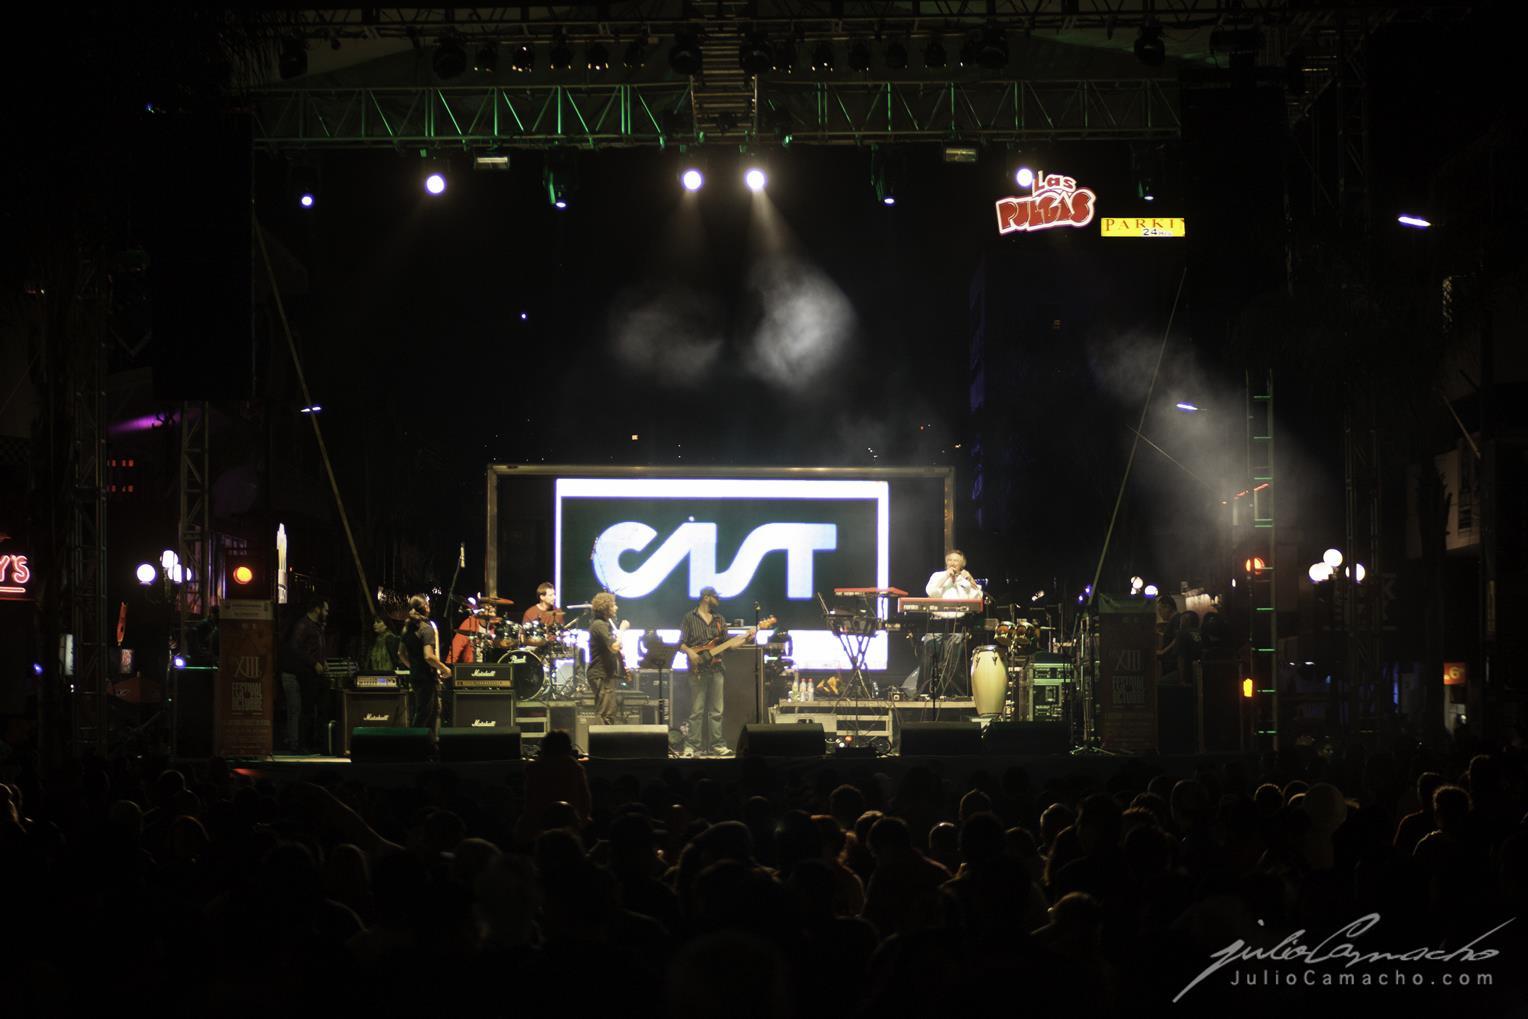 2014-10-30 31 CAST TOUR Ensenada y Tijuana - 1434 - www.Juli (Copy).jpg